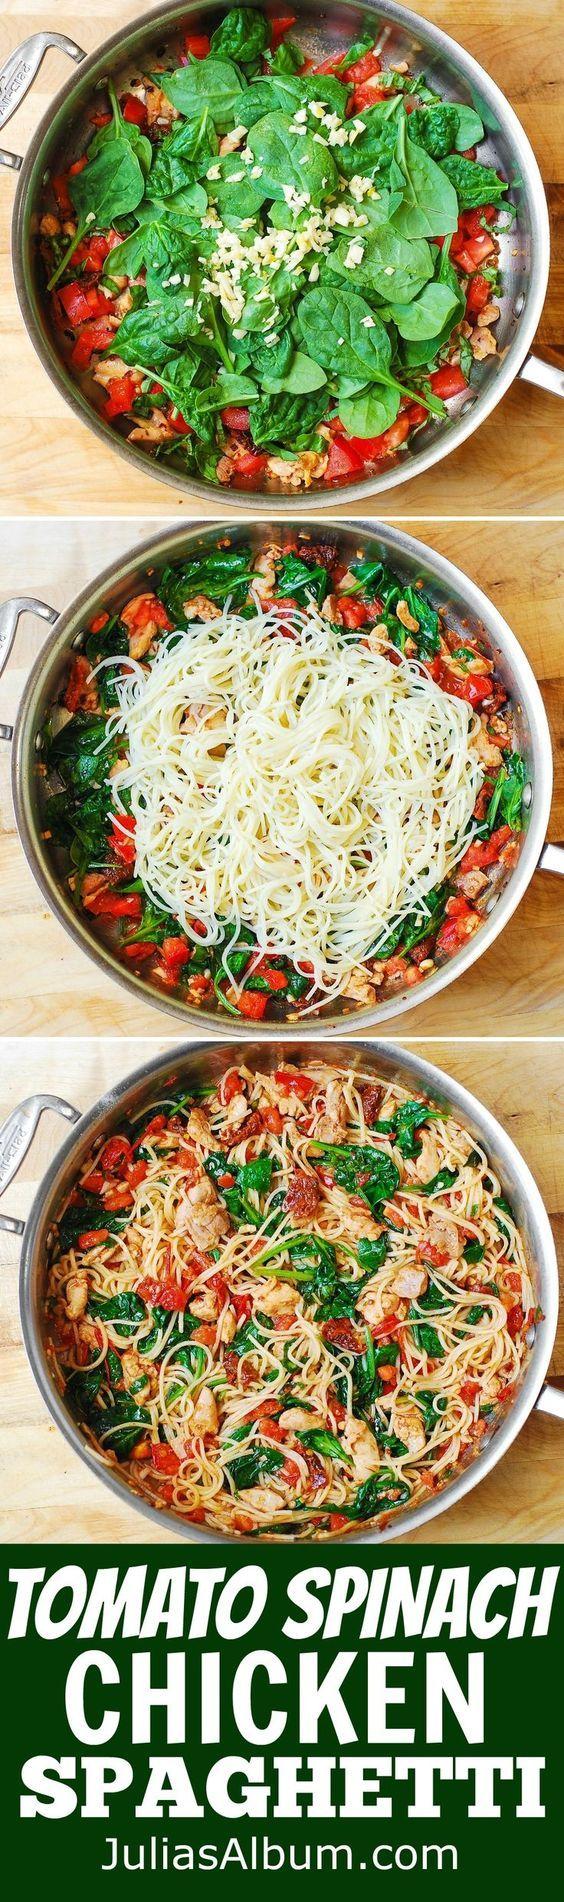 Tomato Basil and Spinach Chicken Spaghetti healthy light Mediterranean